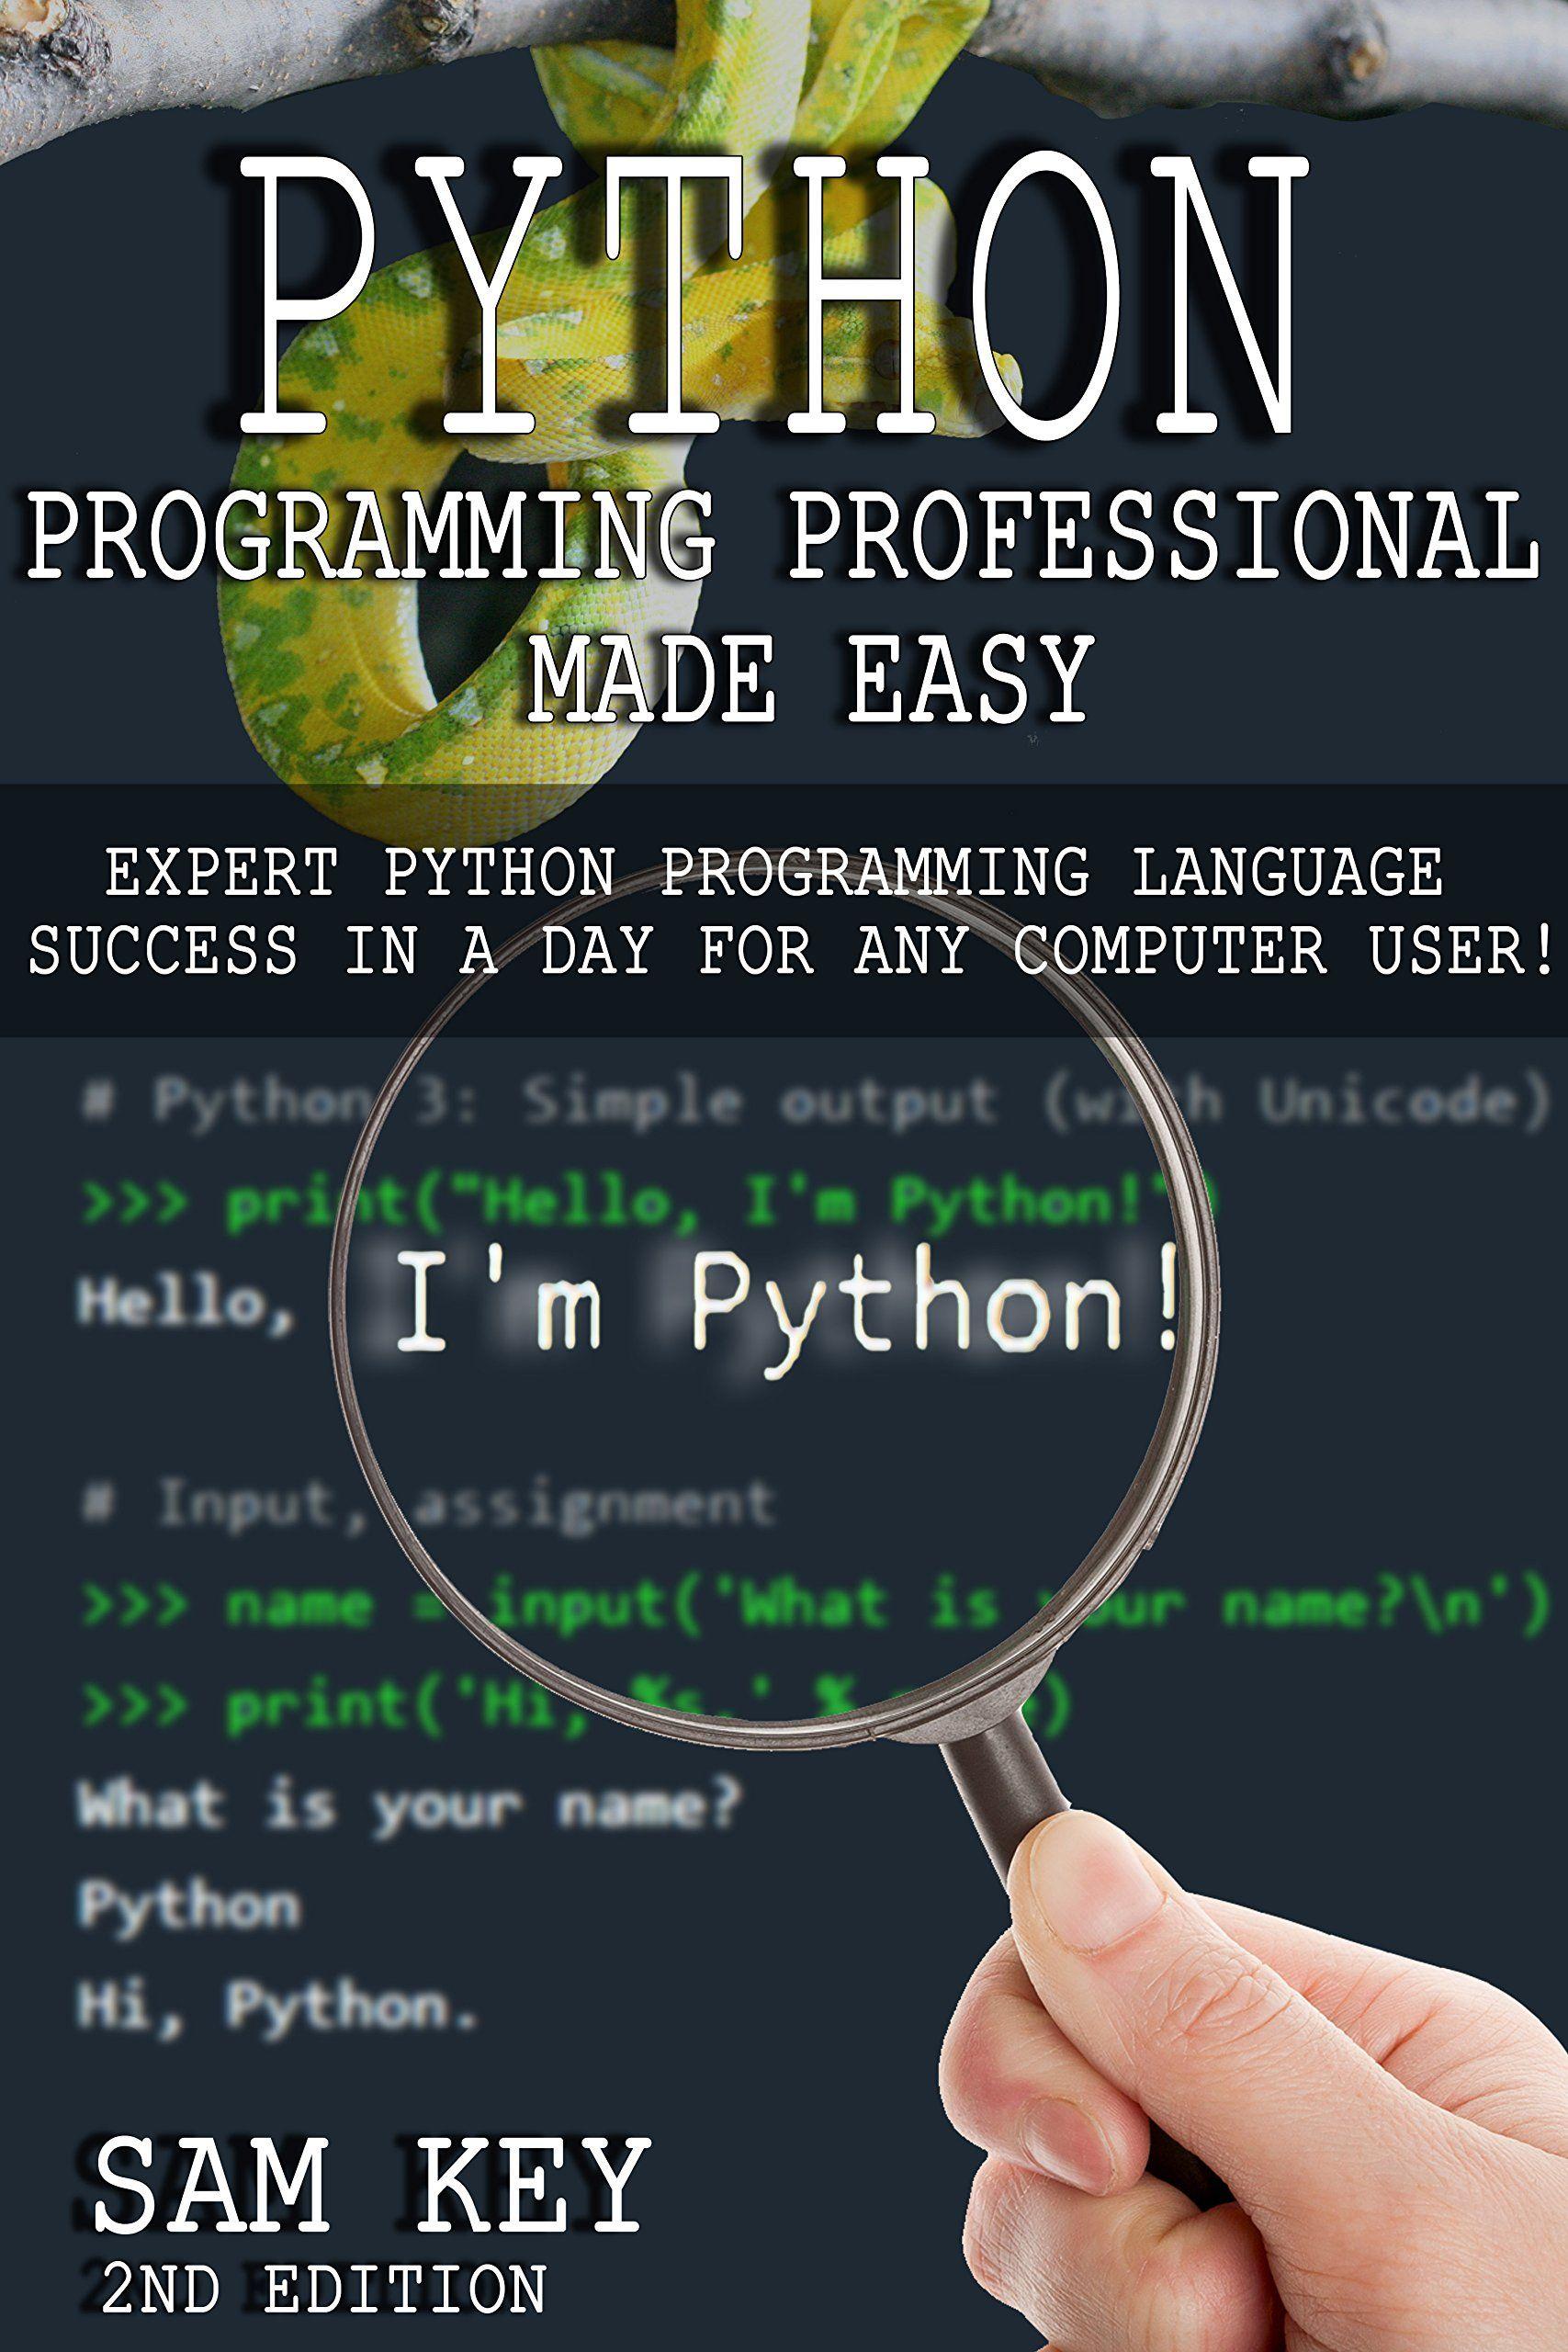 Python Programming Professional Made Easy 2nd Edition! Expert Python